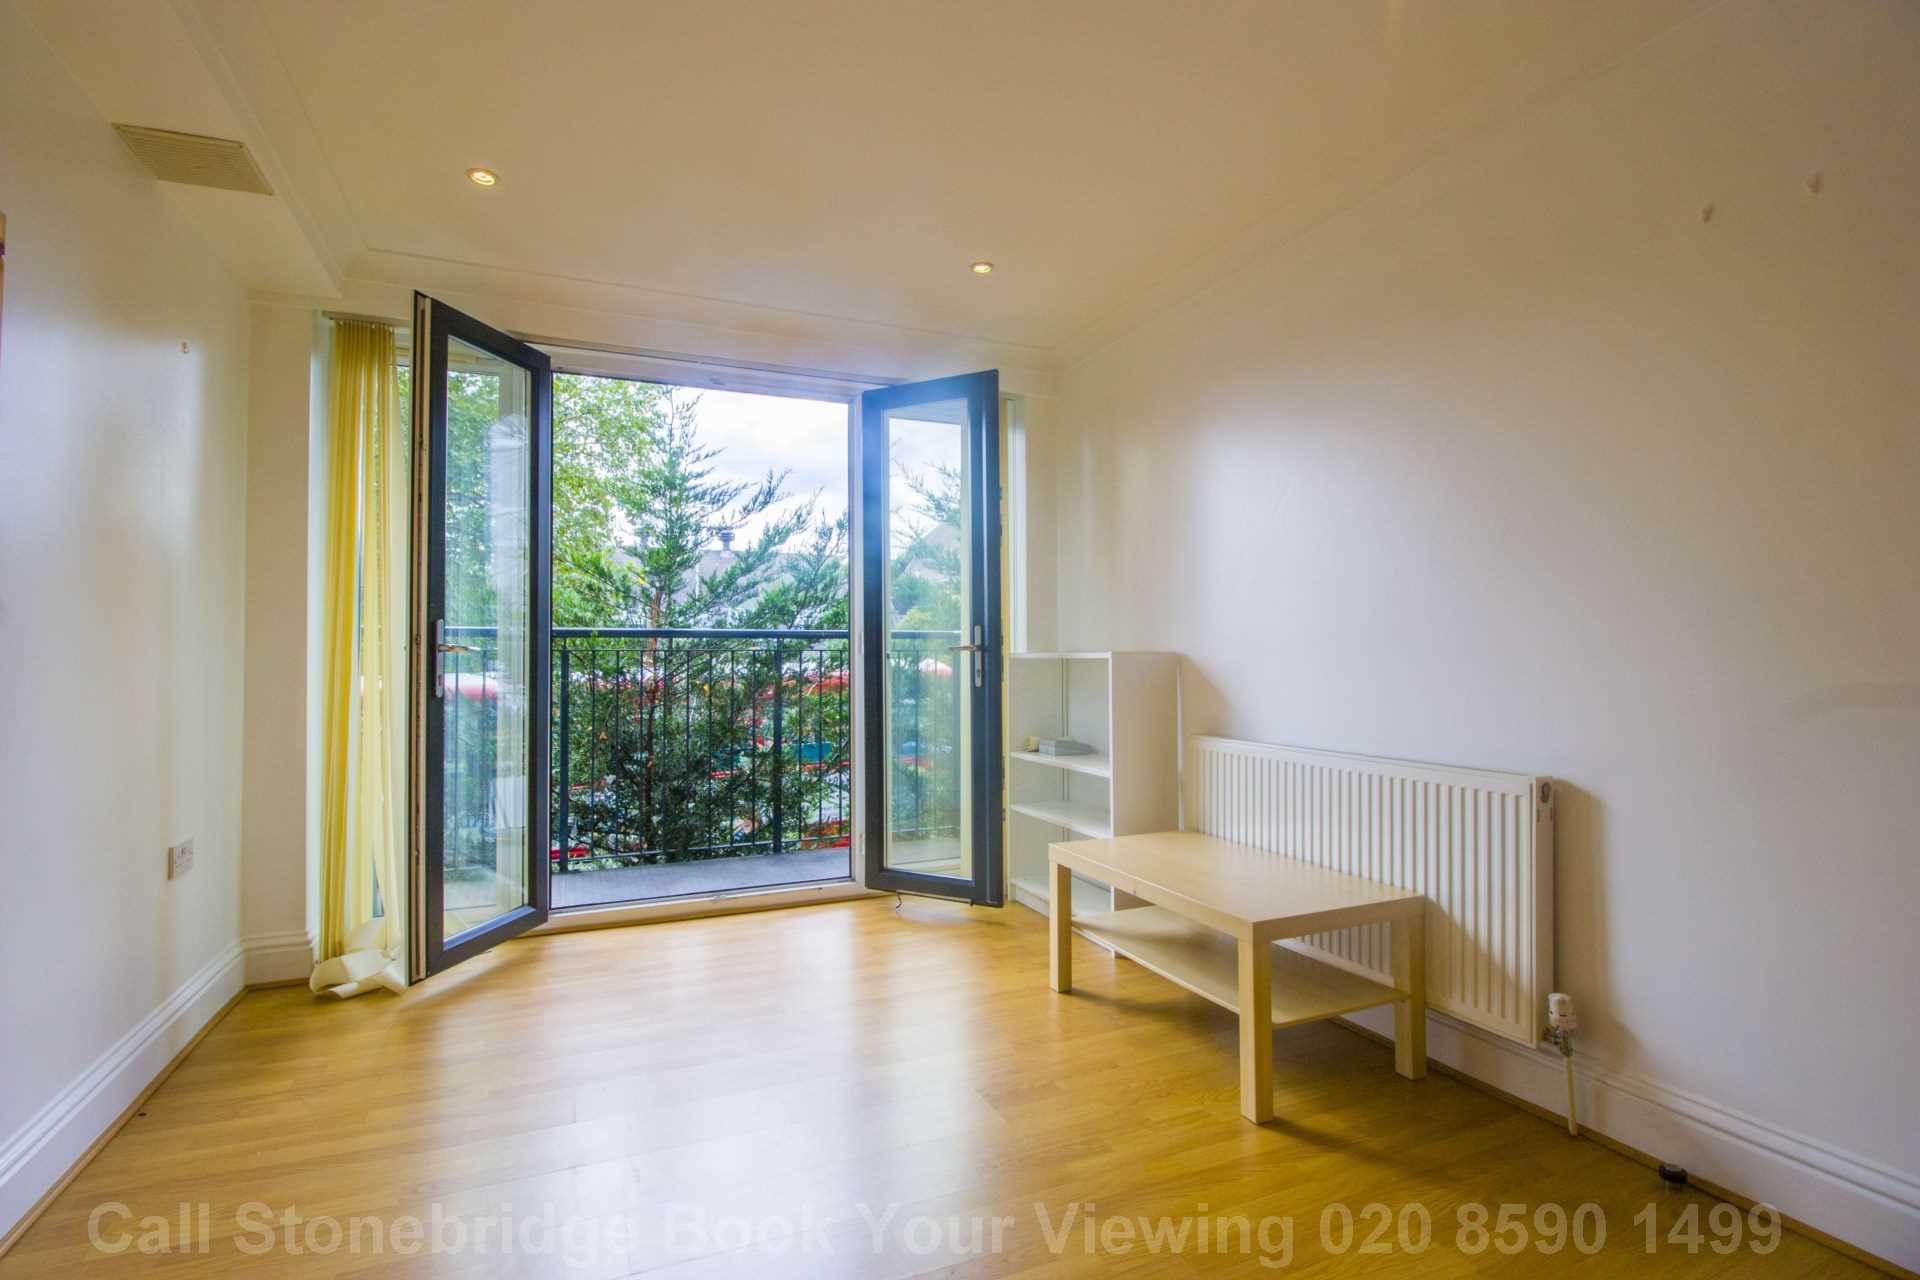 Fari Court, Tower Mews, London E17, Image 1